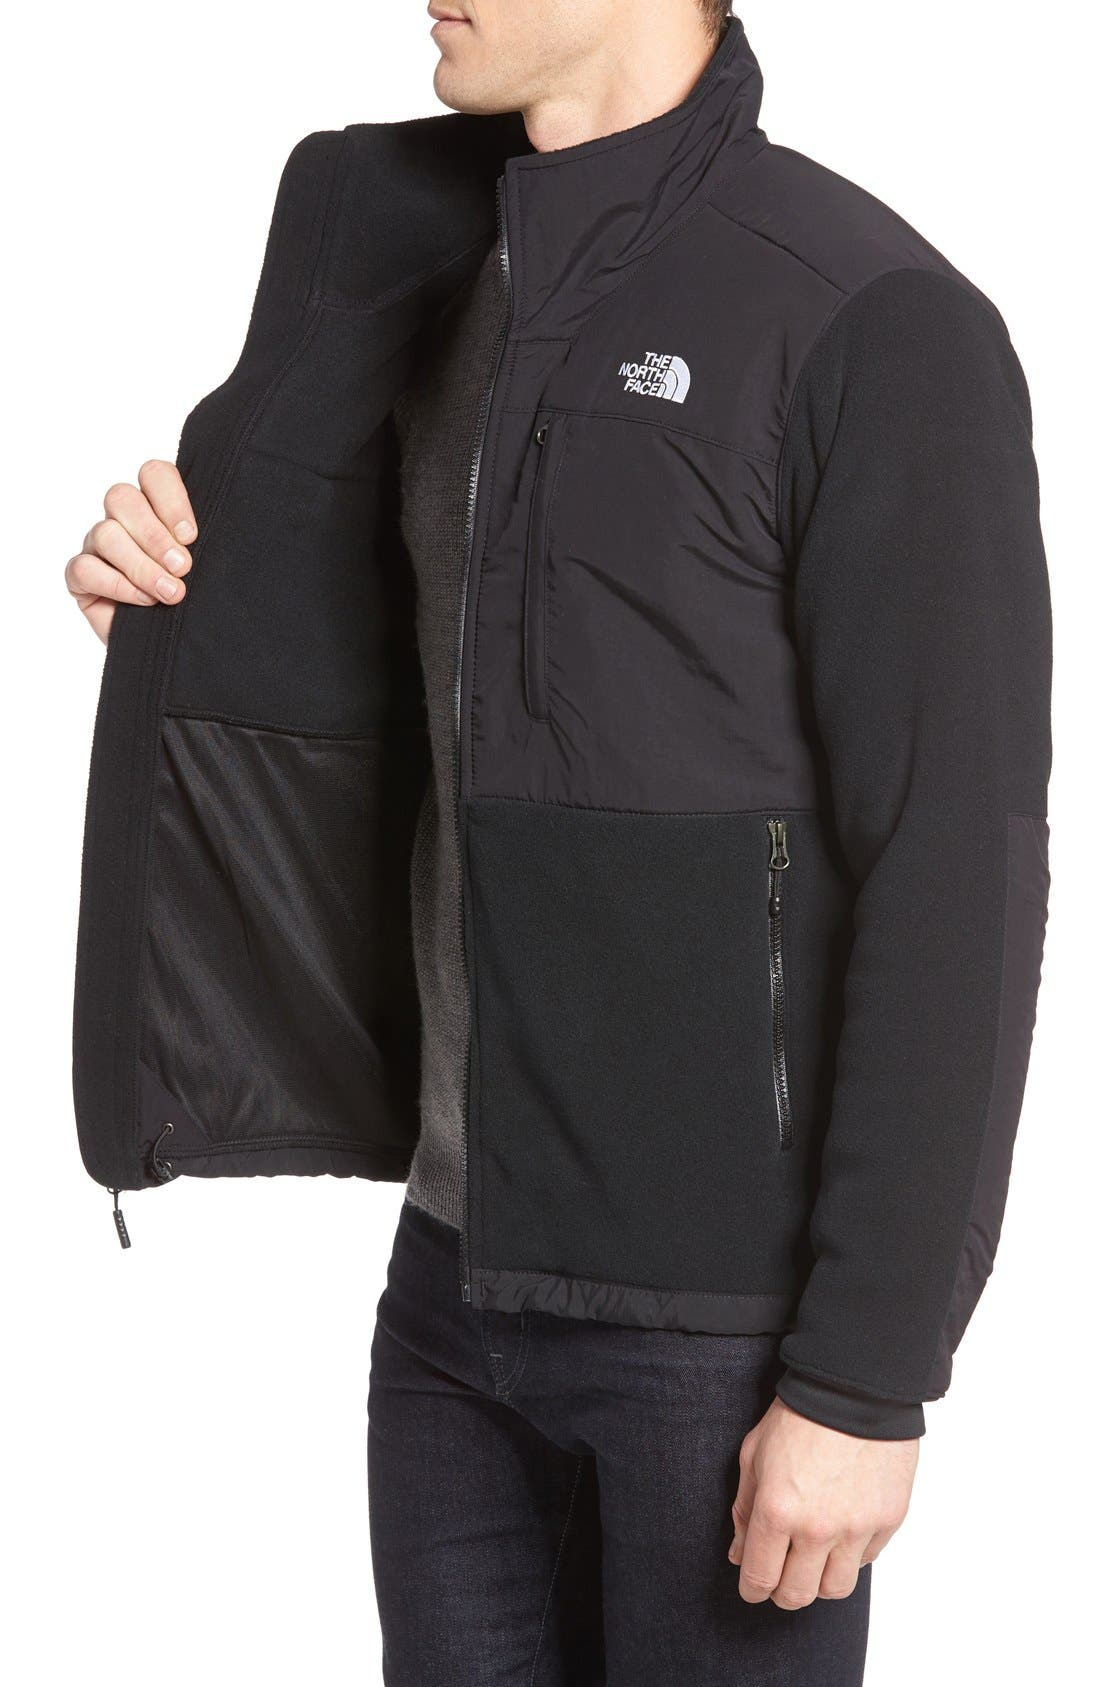 Denali 2 Recycled Fleece Jacket,                             Alternate thumbnail 9, color,                             001